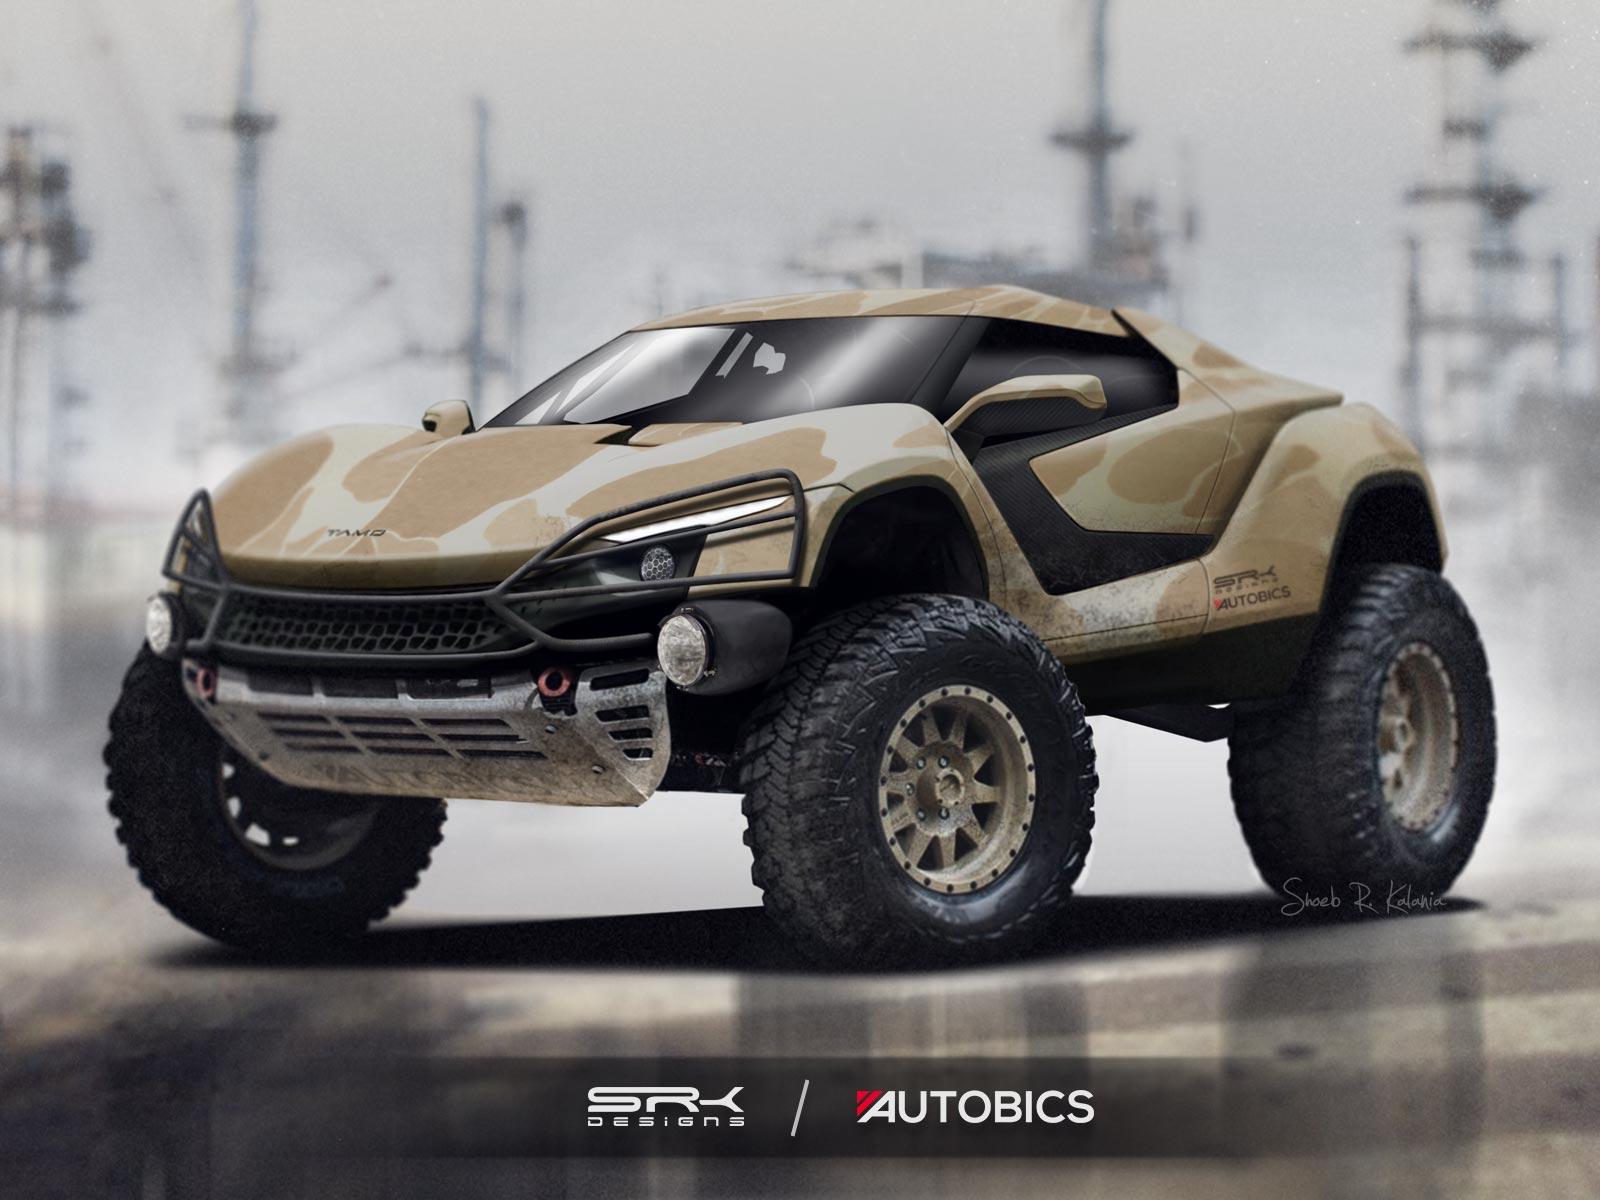 Tamo Racemo modified into an offroad machine